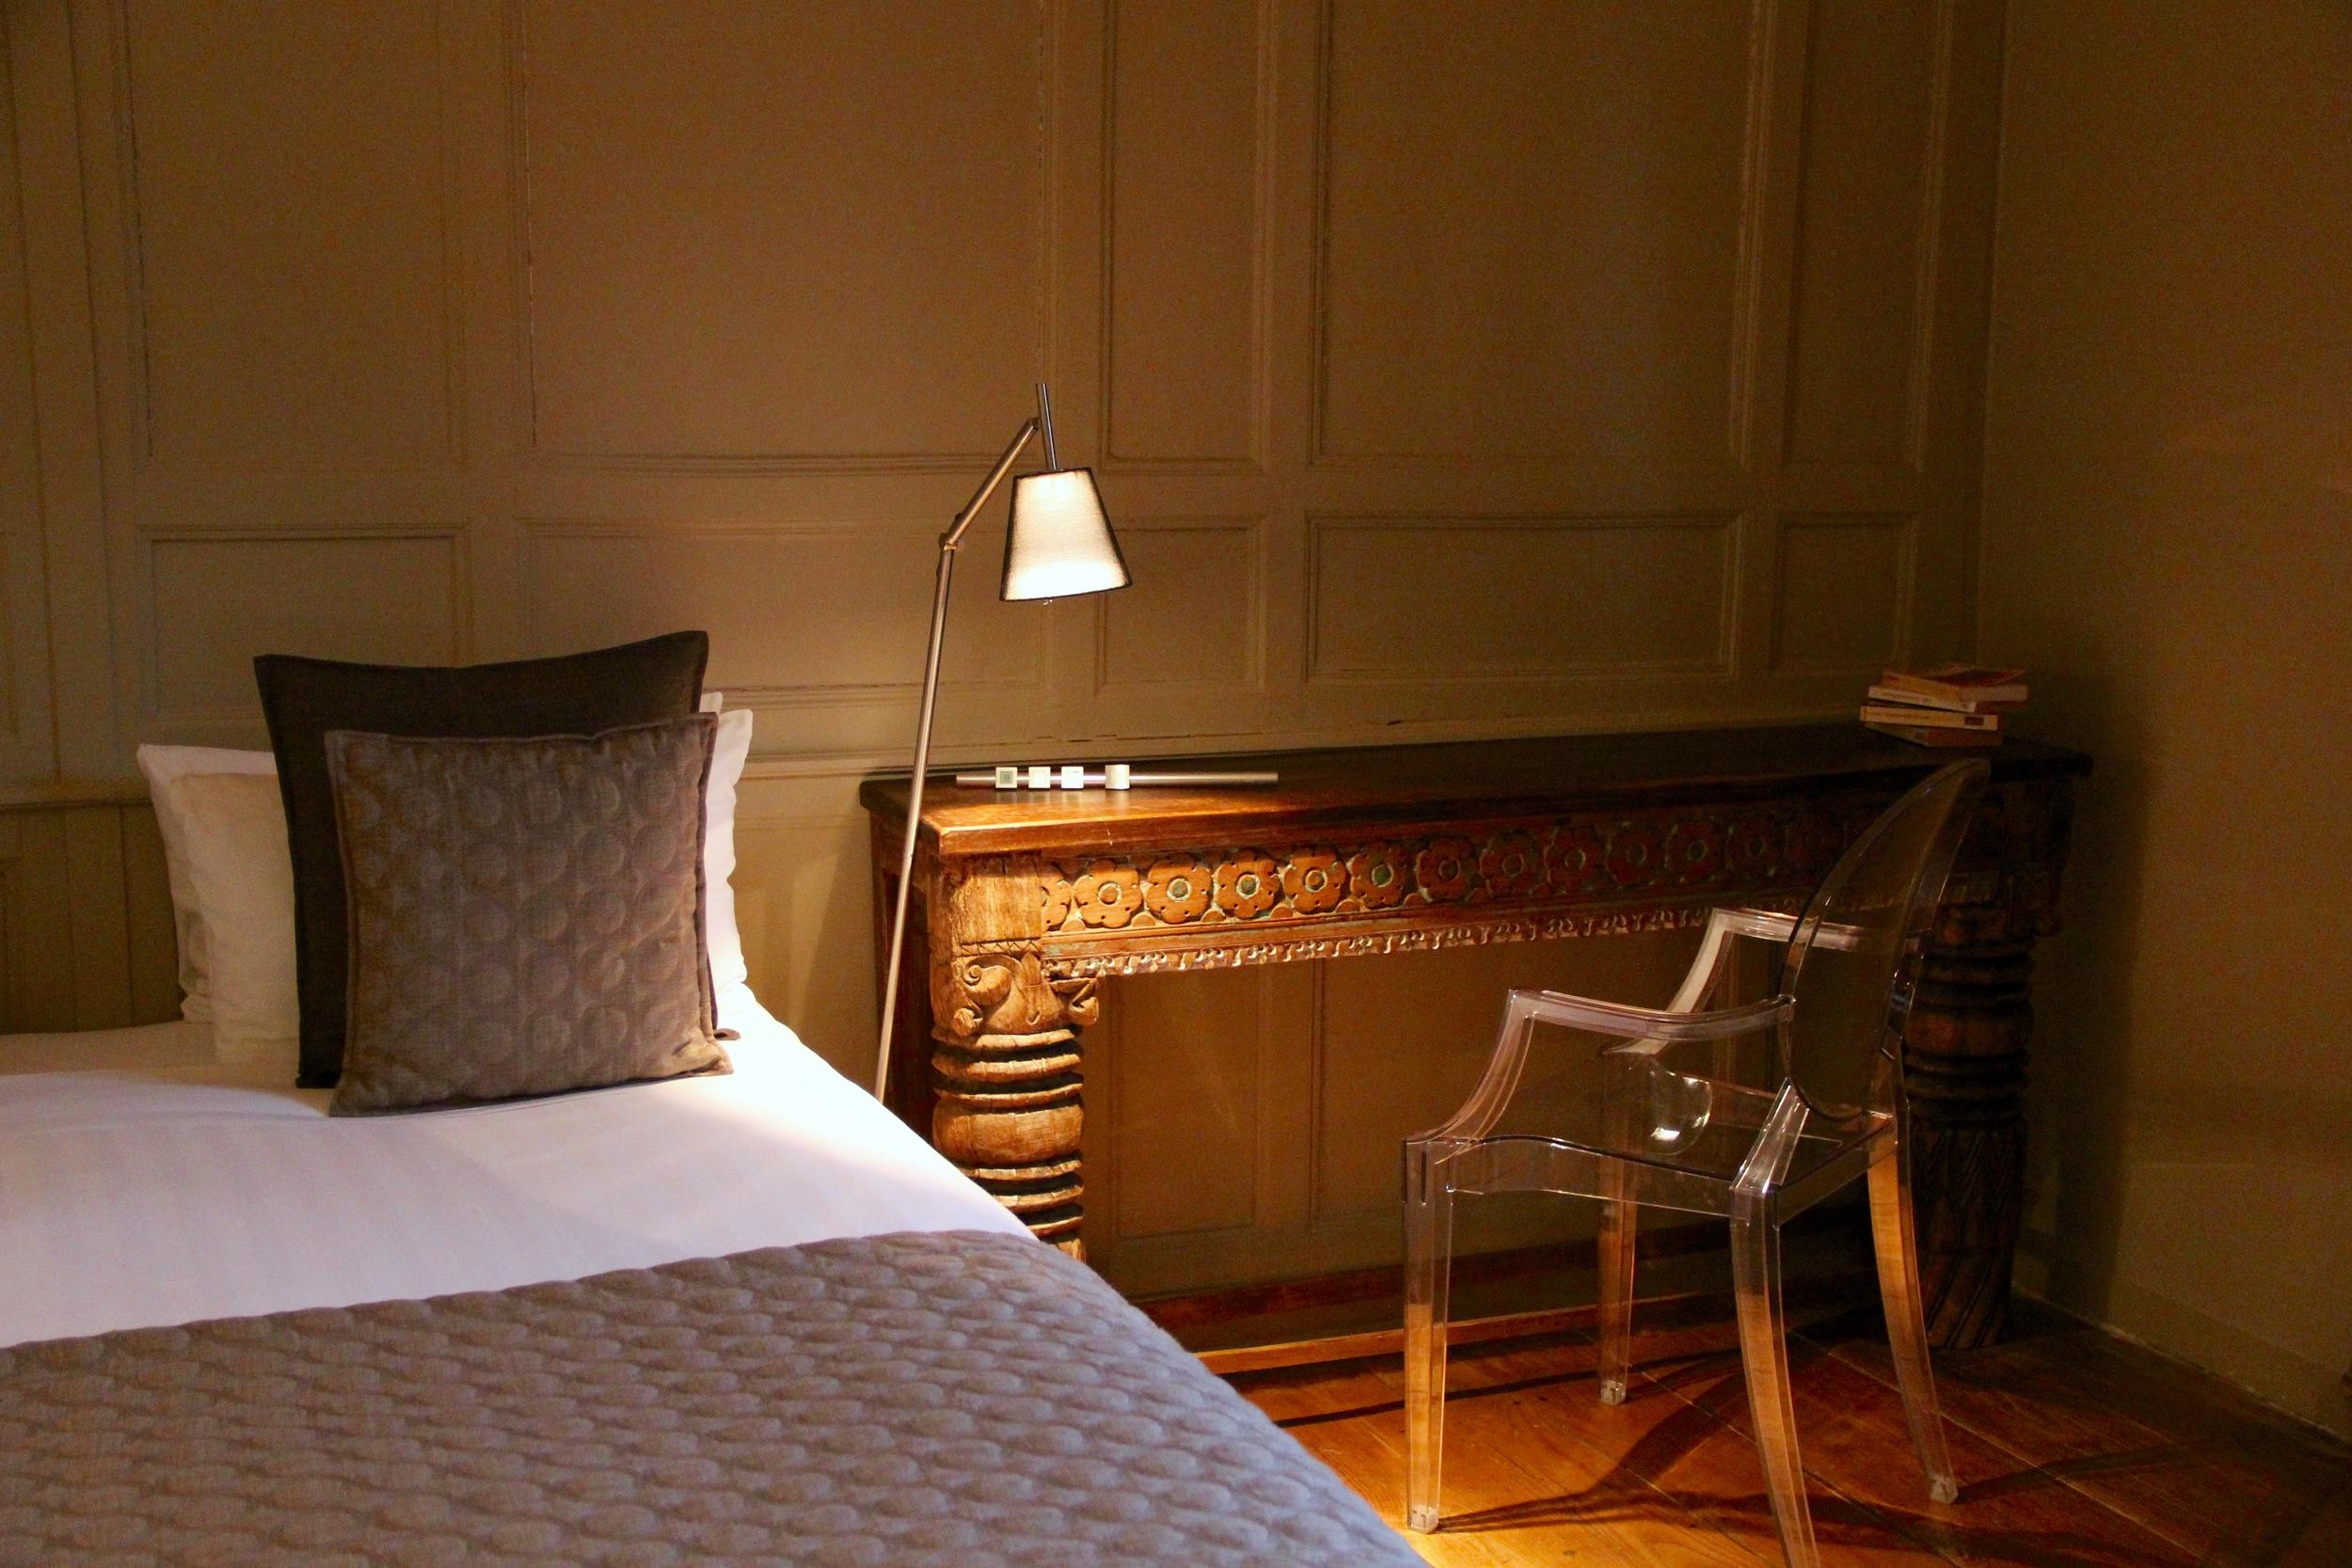 Ankor Room at La Maison Pavie, Dinan, France